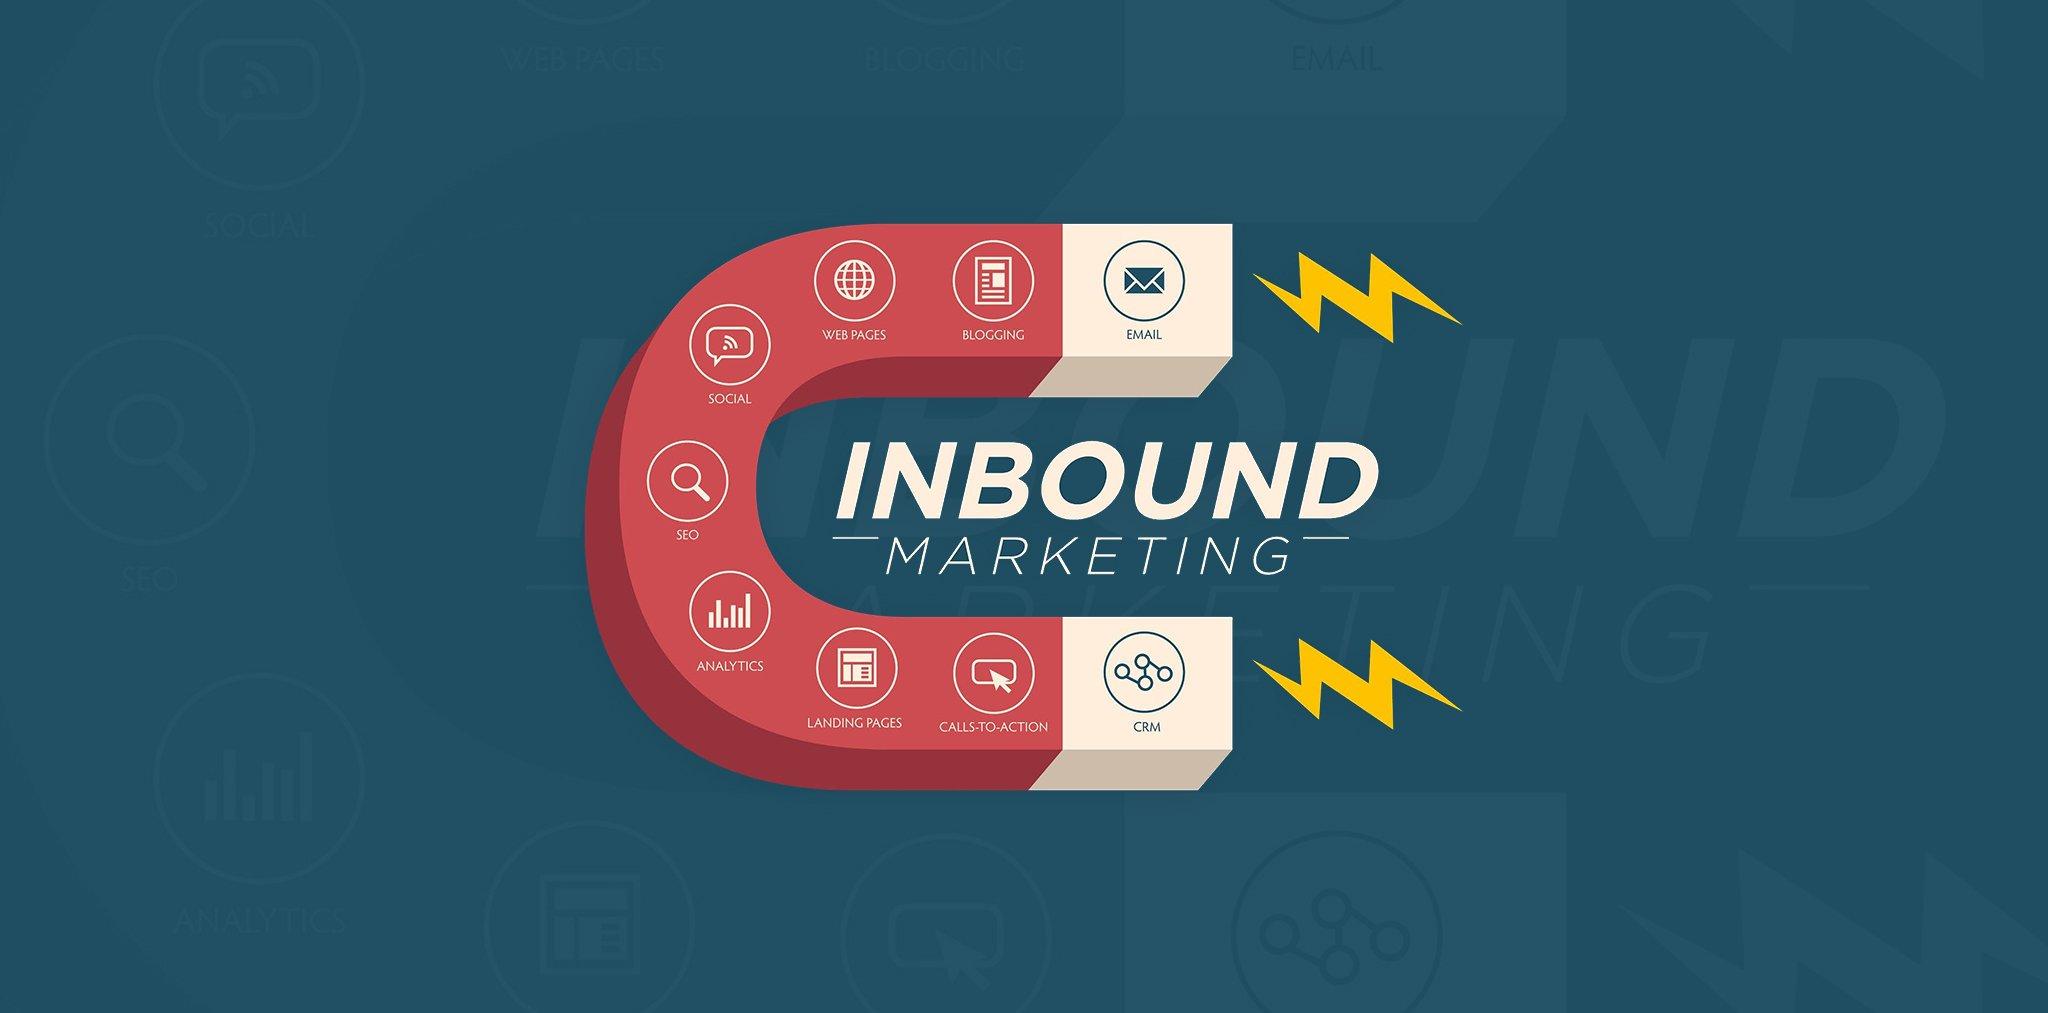 How Effective is Inbound Marketing – Statistics and Trends